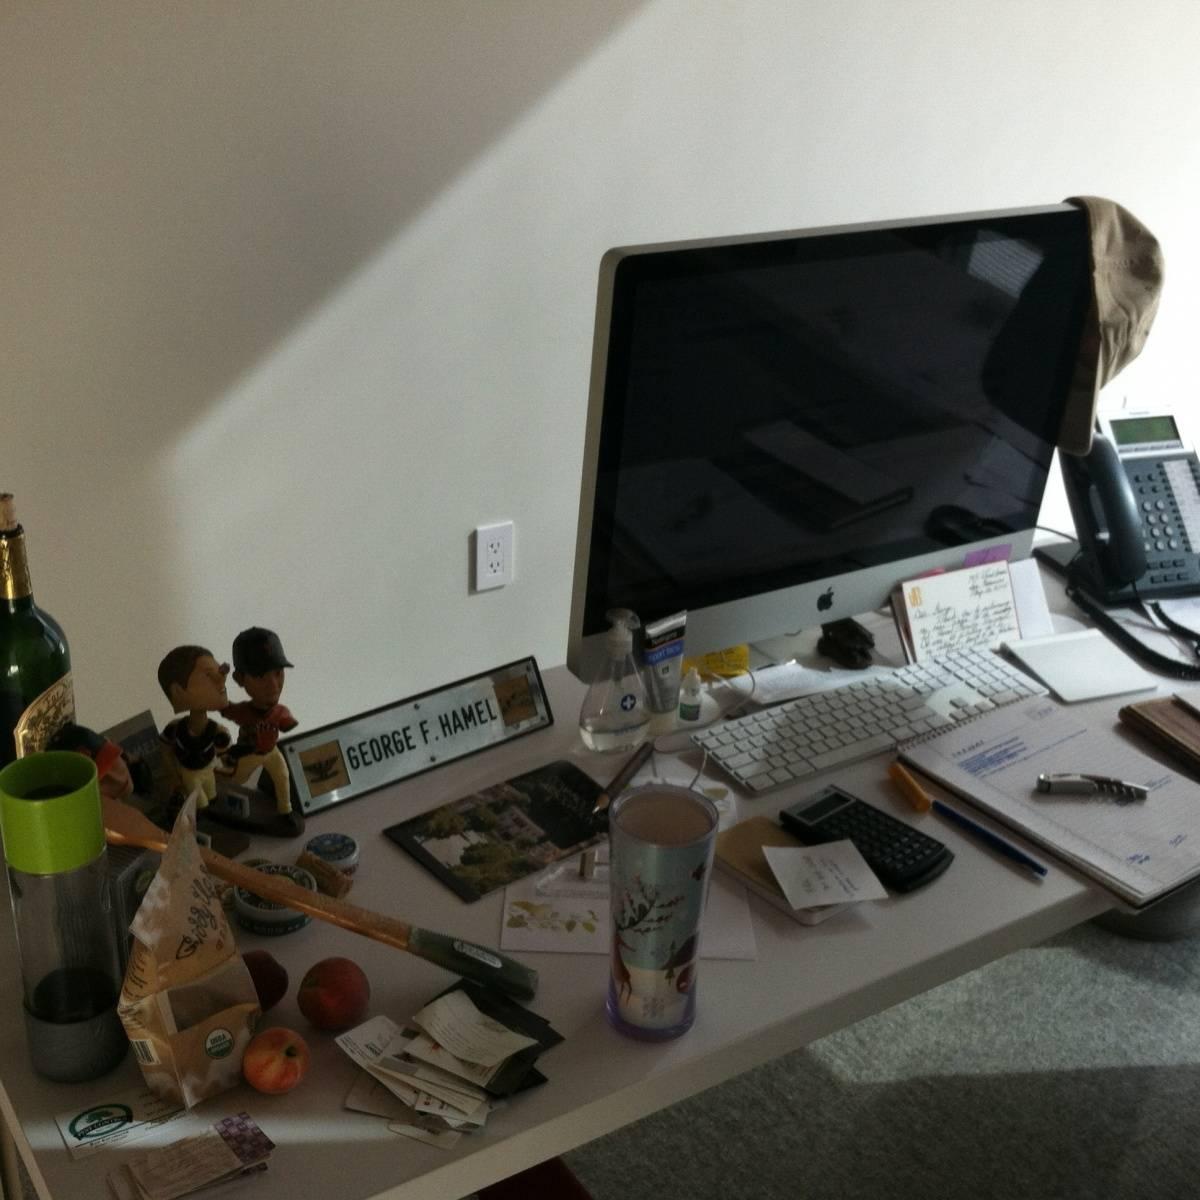 George Hammel's Desk